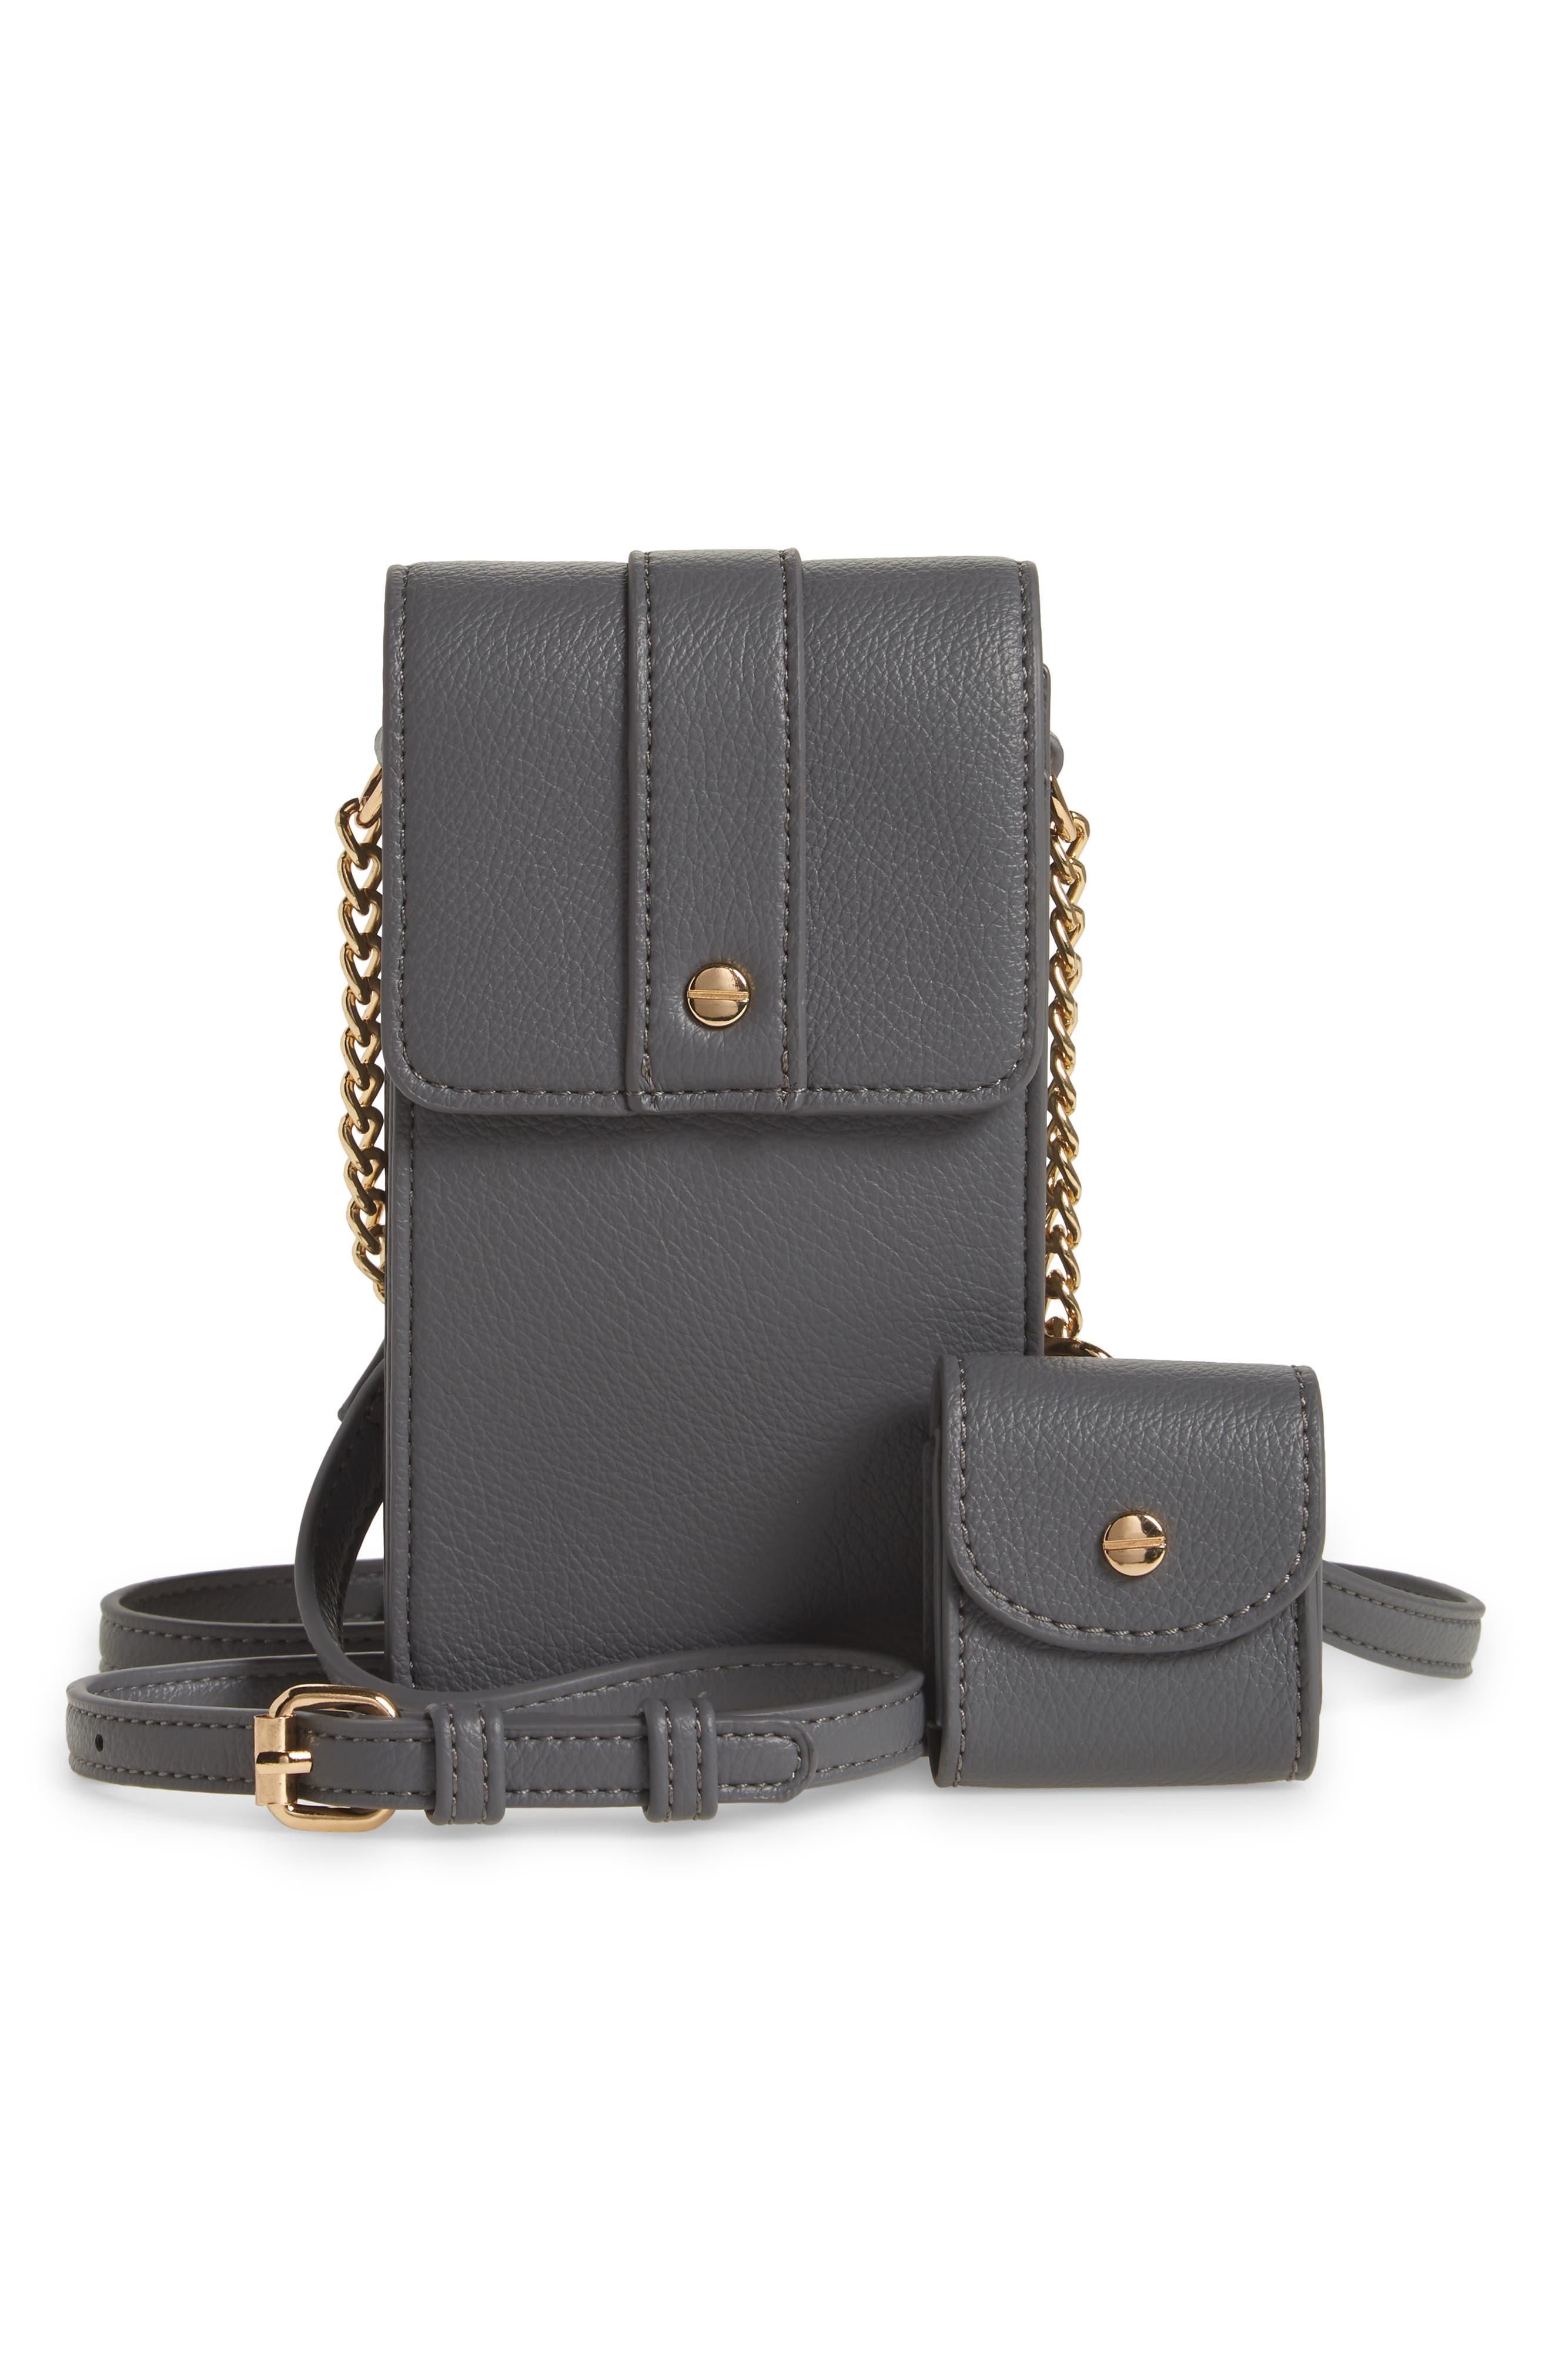 Mali + Lili Vegan Leather Phone Crossbody Bag